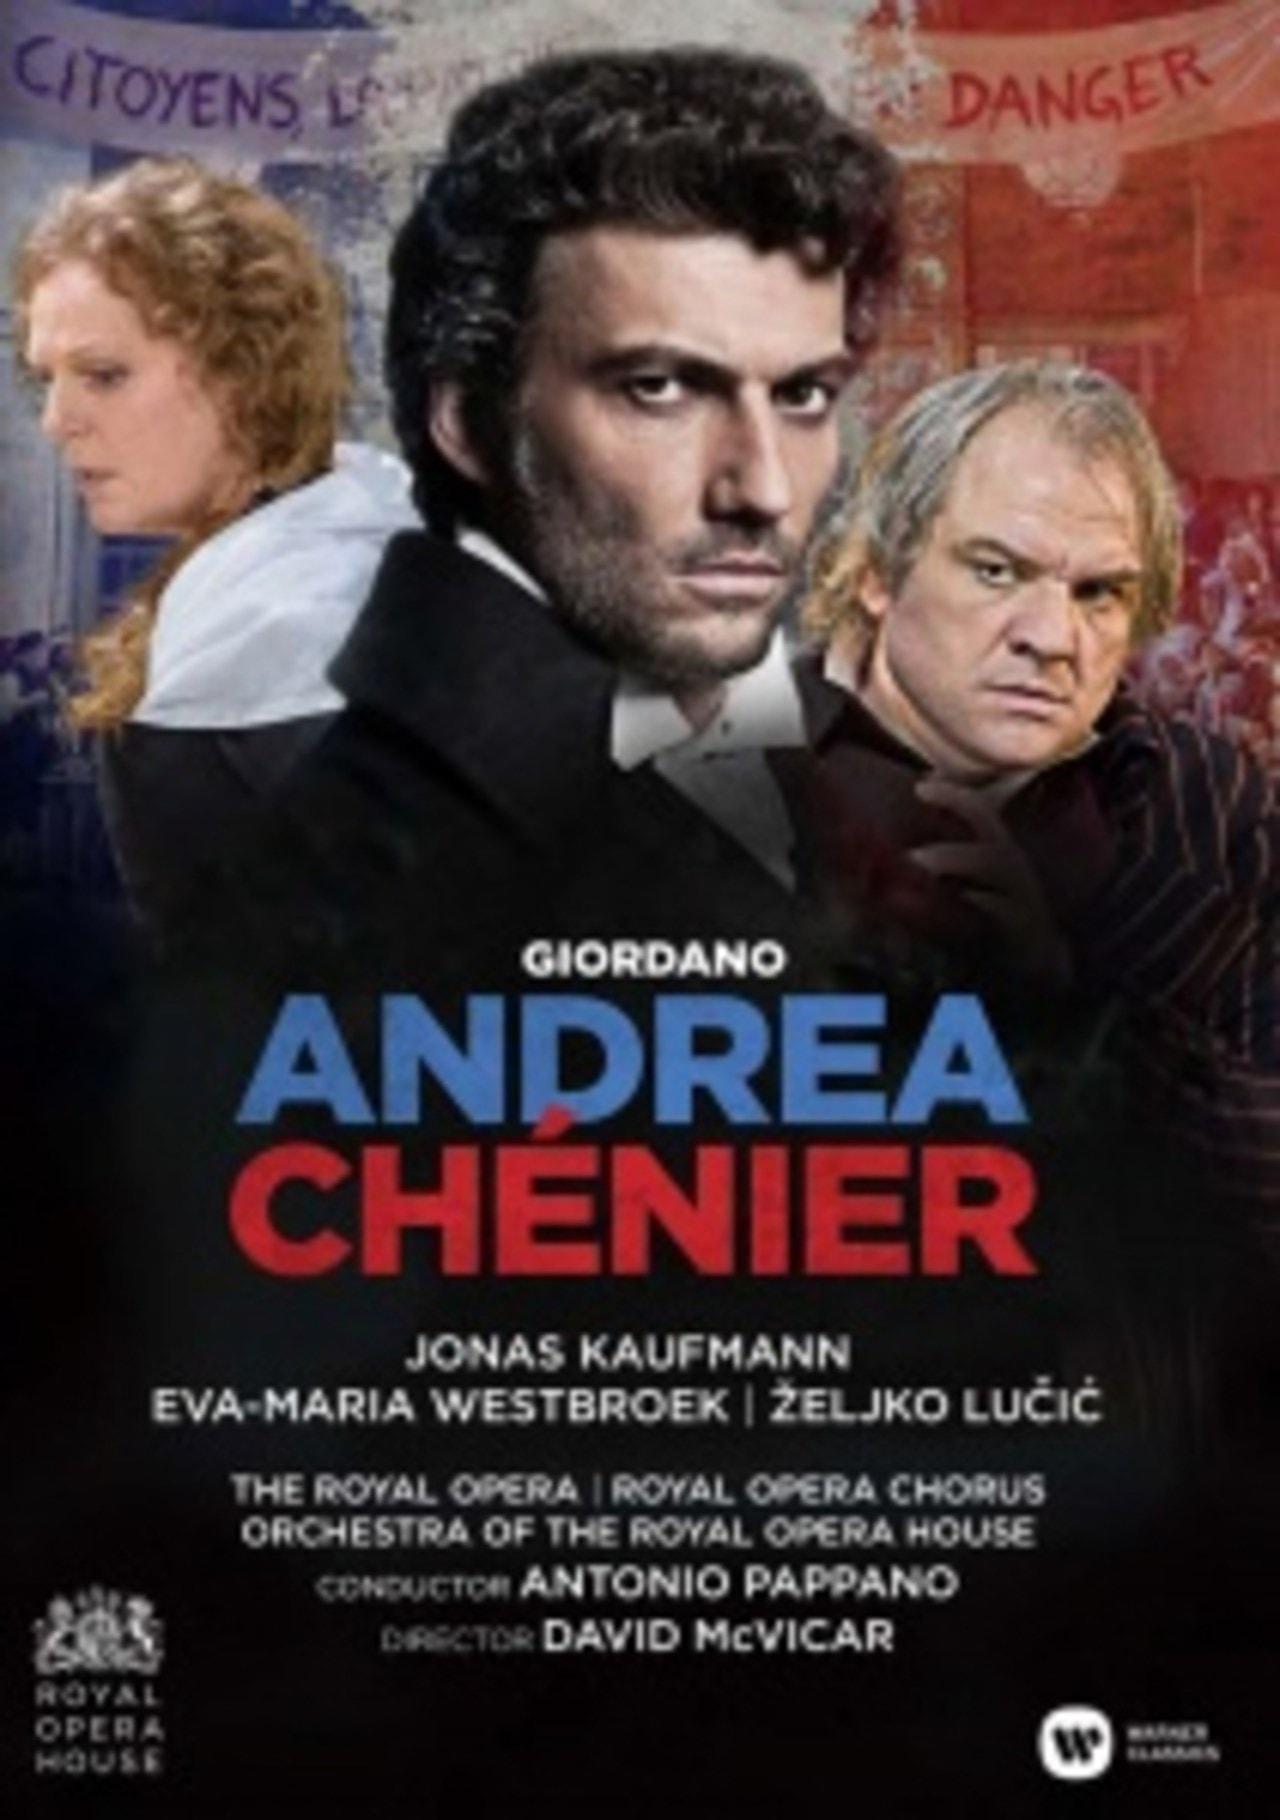 Andrea Chenier: The Royal Opera (Pappano) - 1